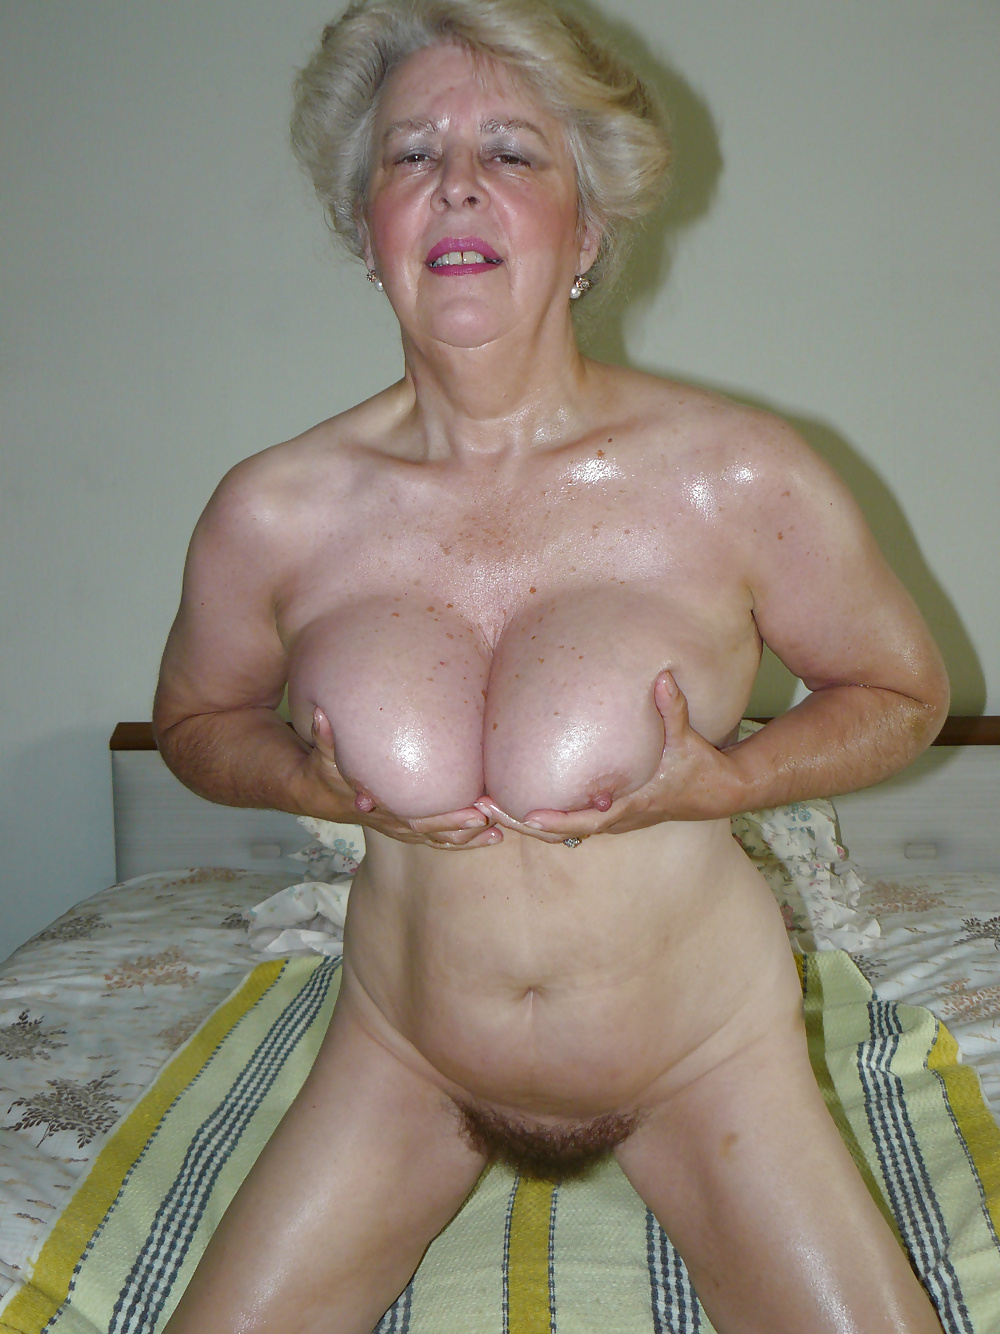 Slut grandma sex